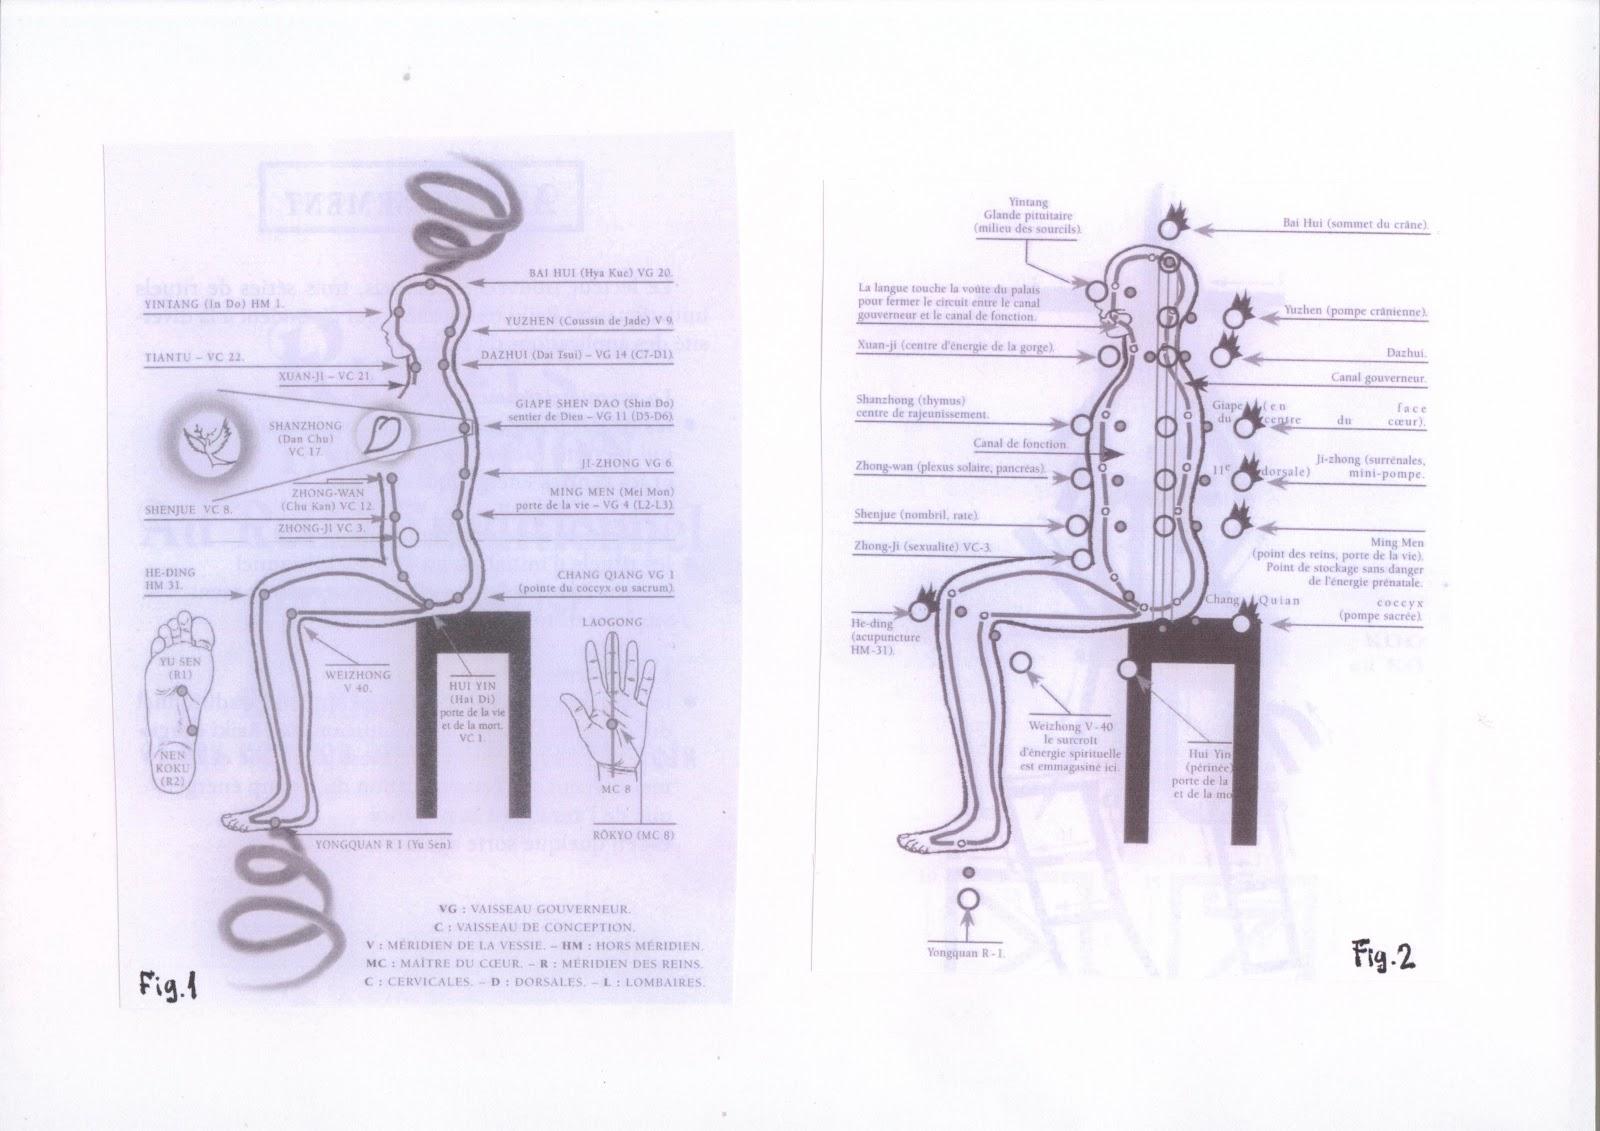 Despre reiki radiestezie si alte asemenea considerations about despre reiki radiestezie si alte asemenea considerations about violet breathkidney breath presentation of dumo breath buycottarizona Images